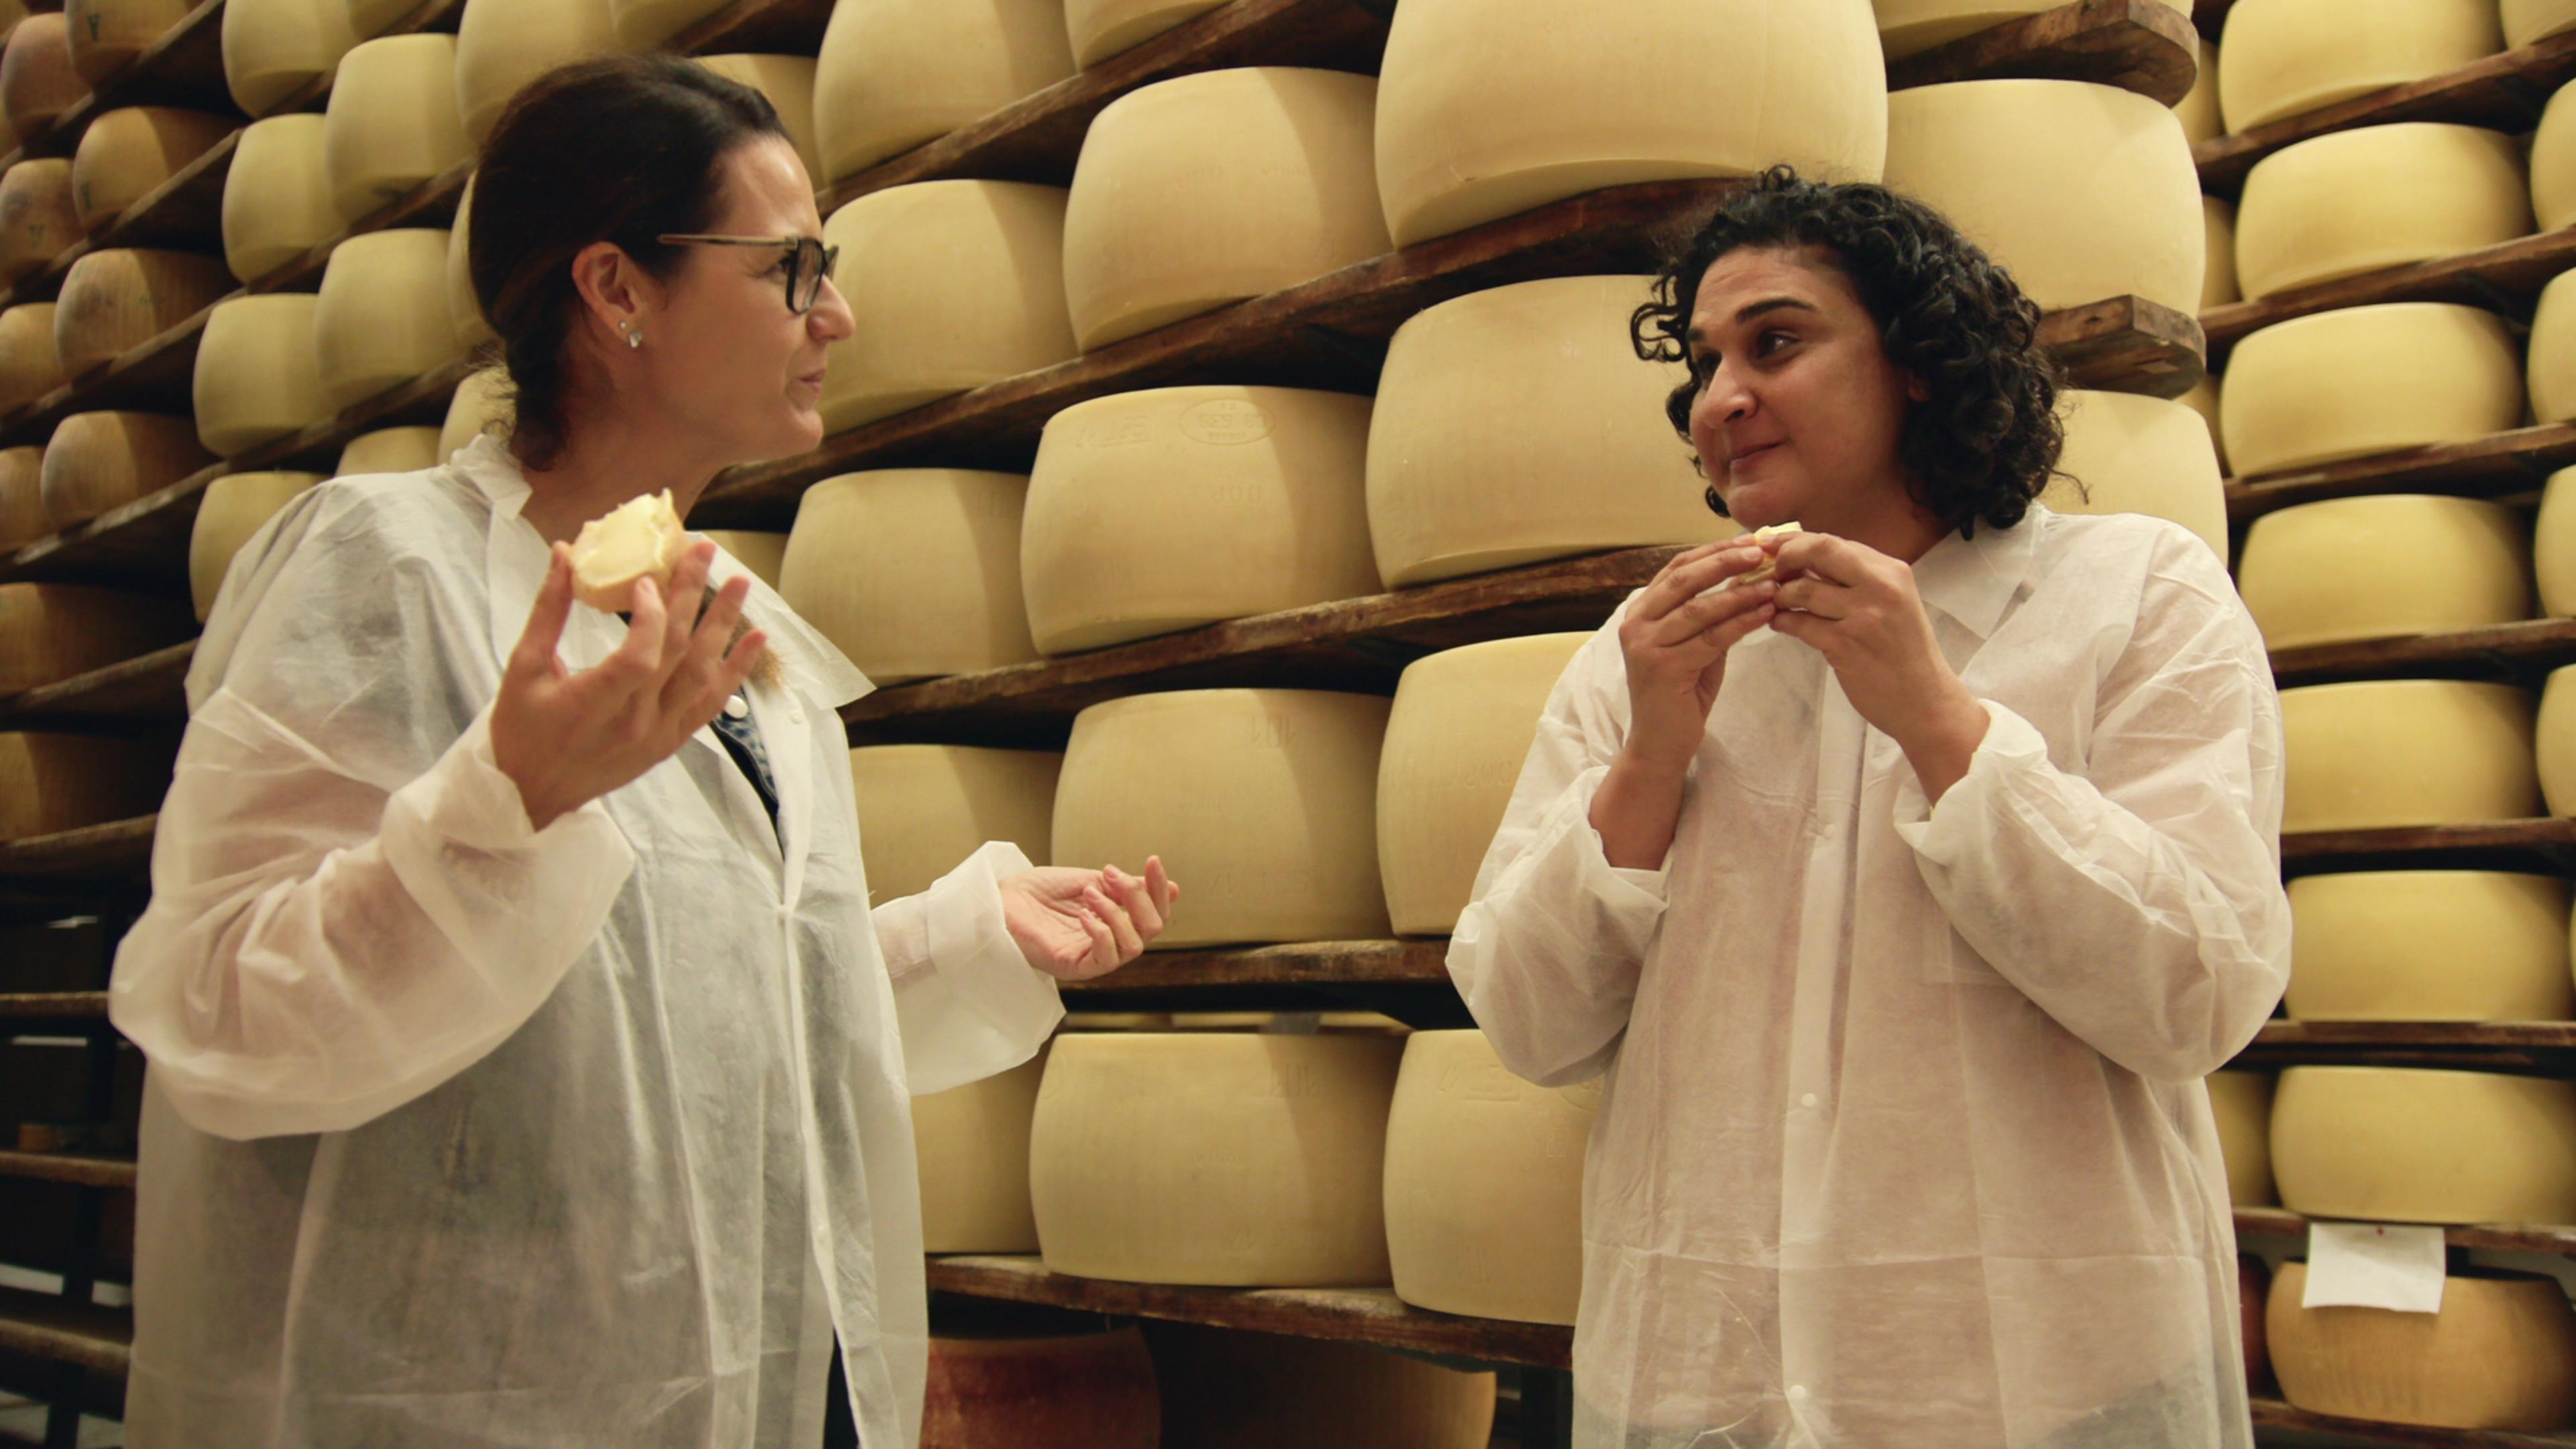 'Salt, Fat, Acid, Heat' Recap: Samin Nosrat Samples the Bounty of Olive Oil and Parmesan in Italy